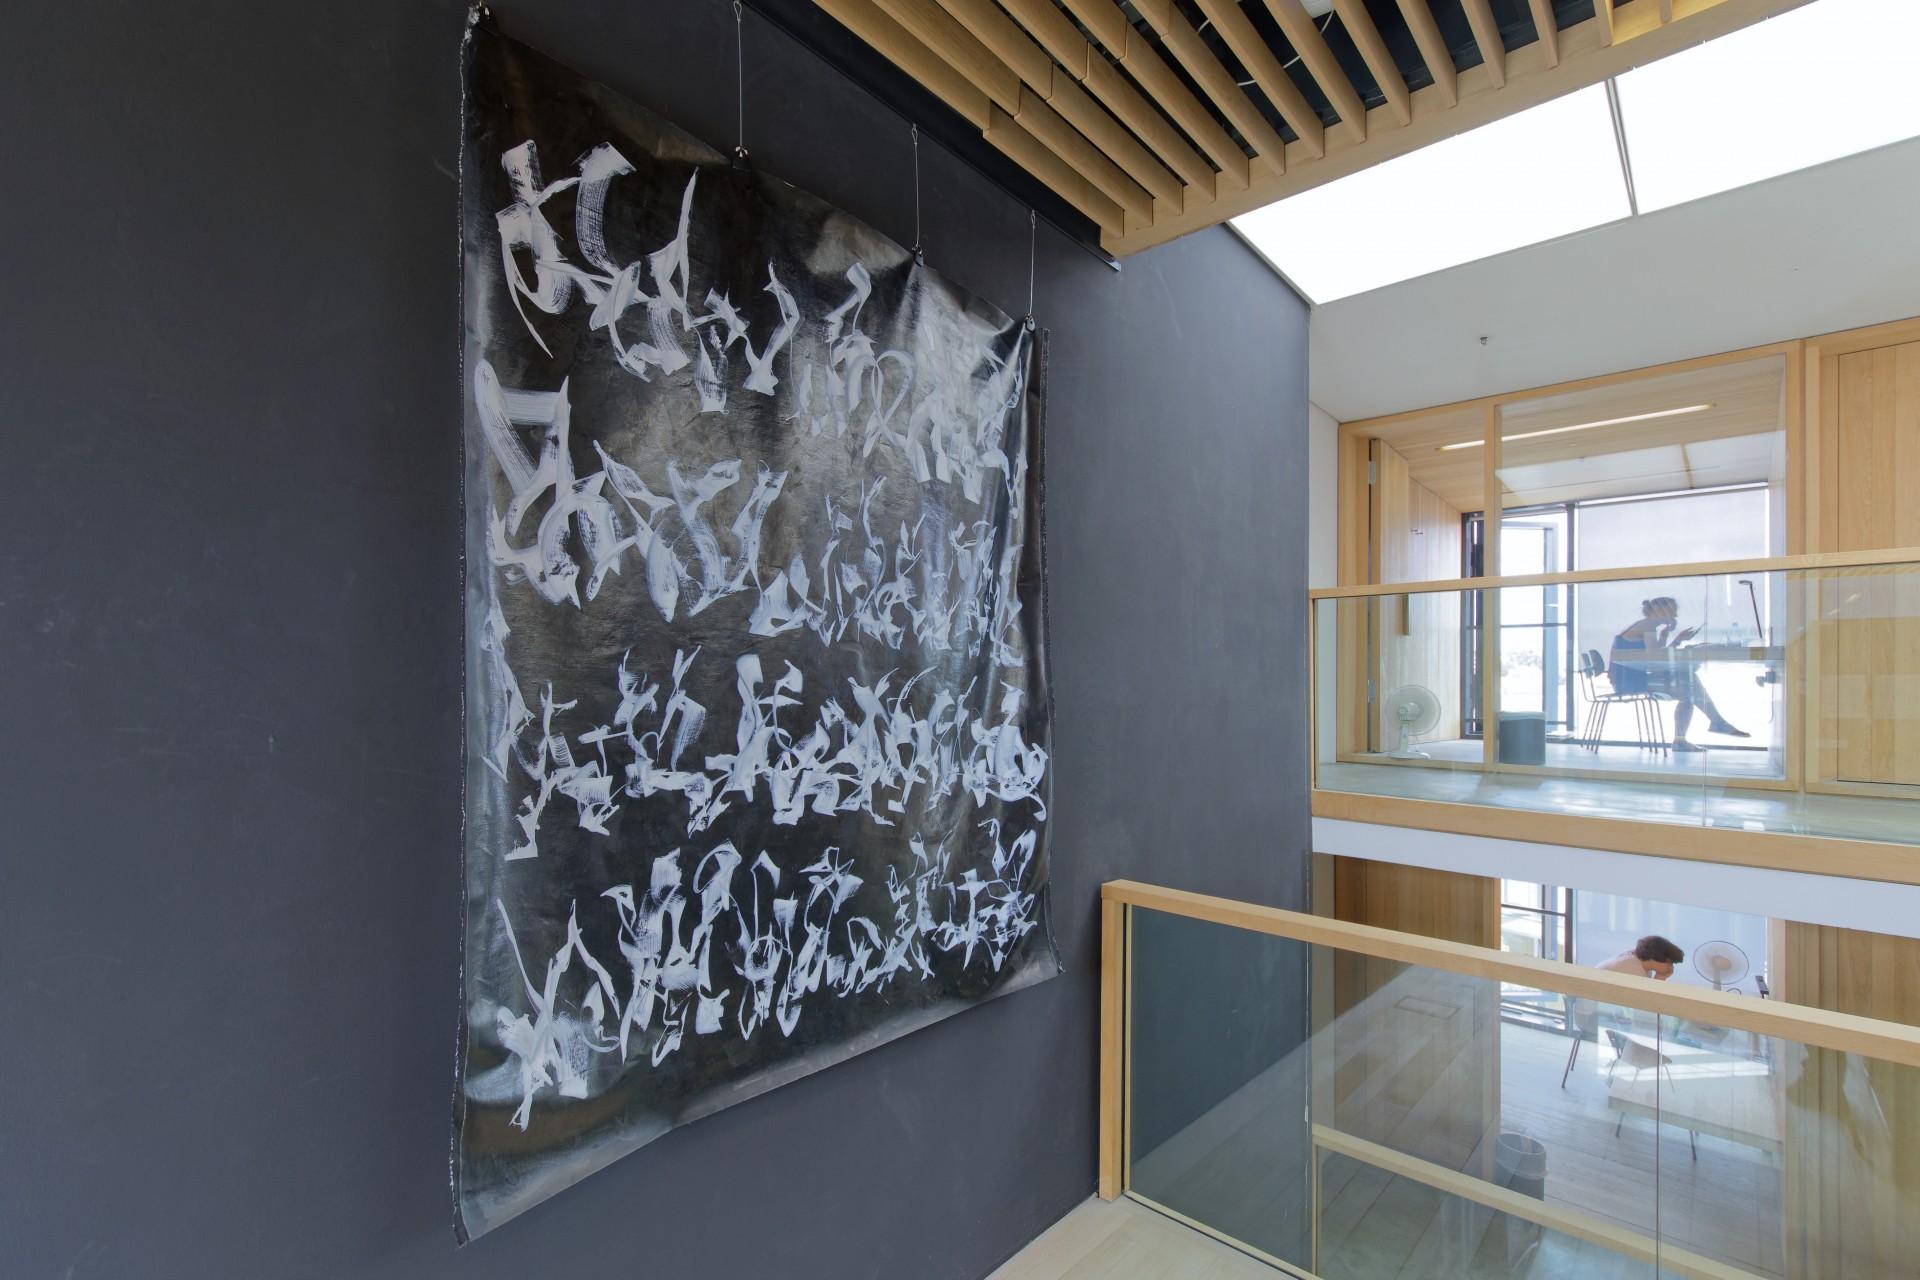 Nr.1599, Acryl auf Leinwand, 160 x 190 cm, 2017